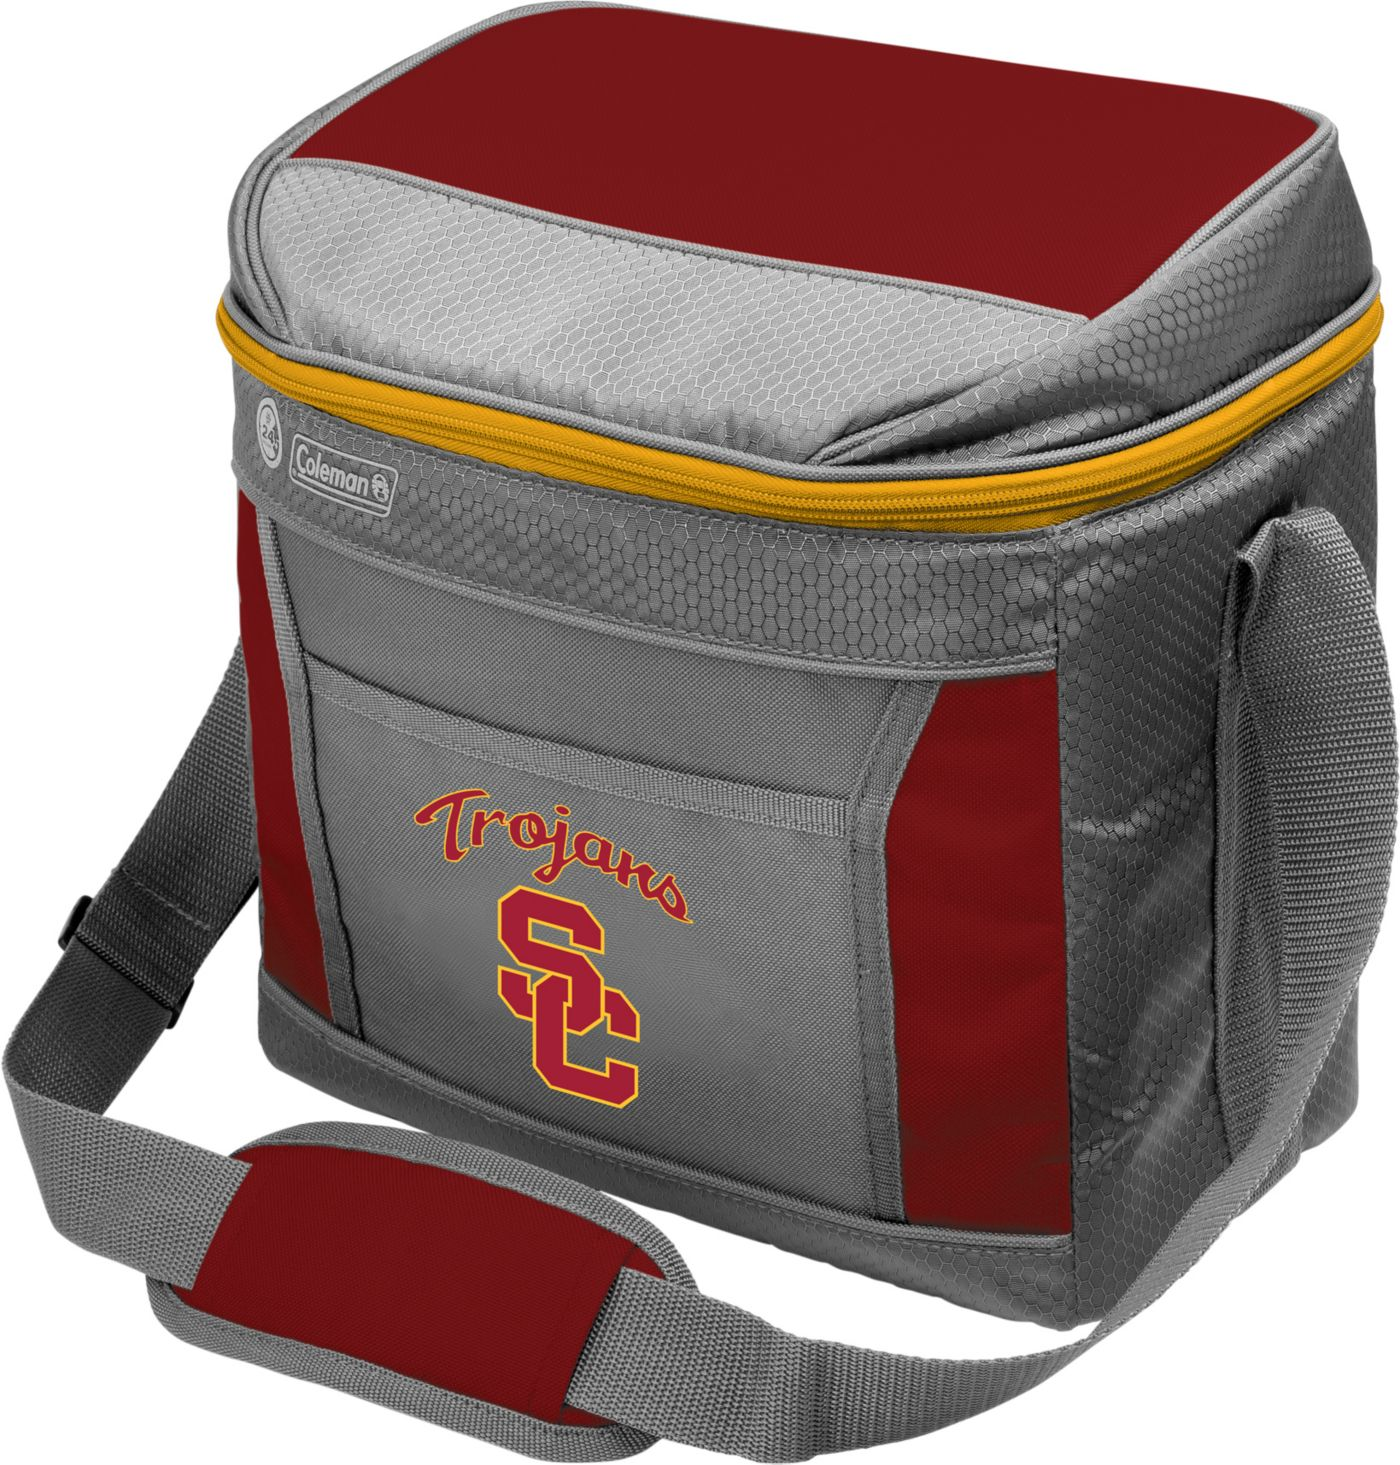 Rawlings USC Trojans 16-Can Cooler